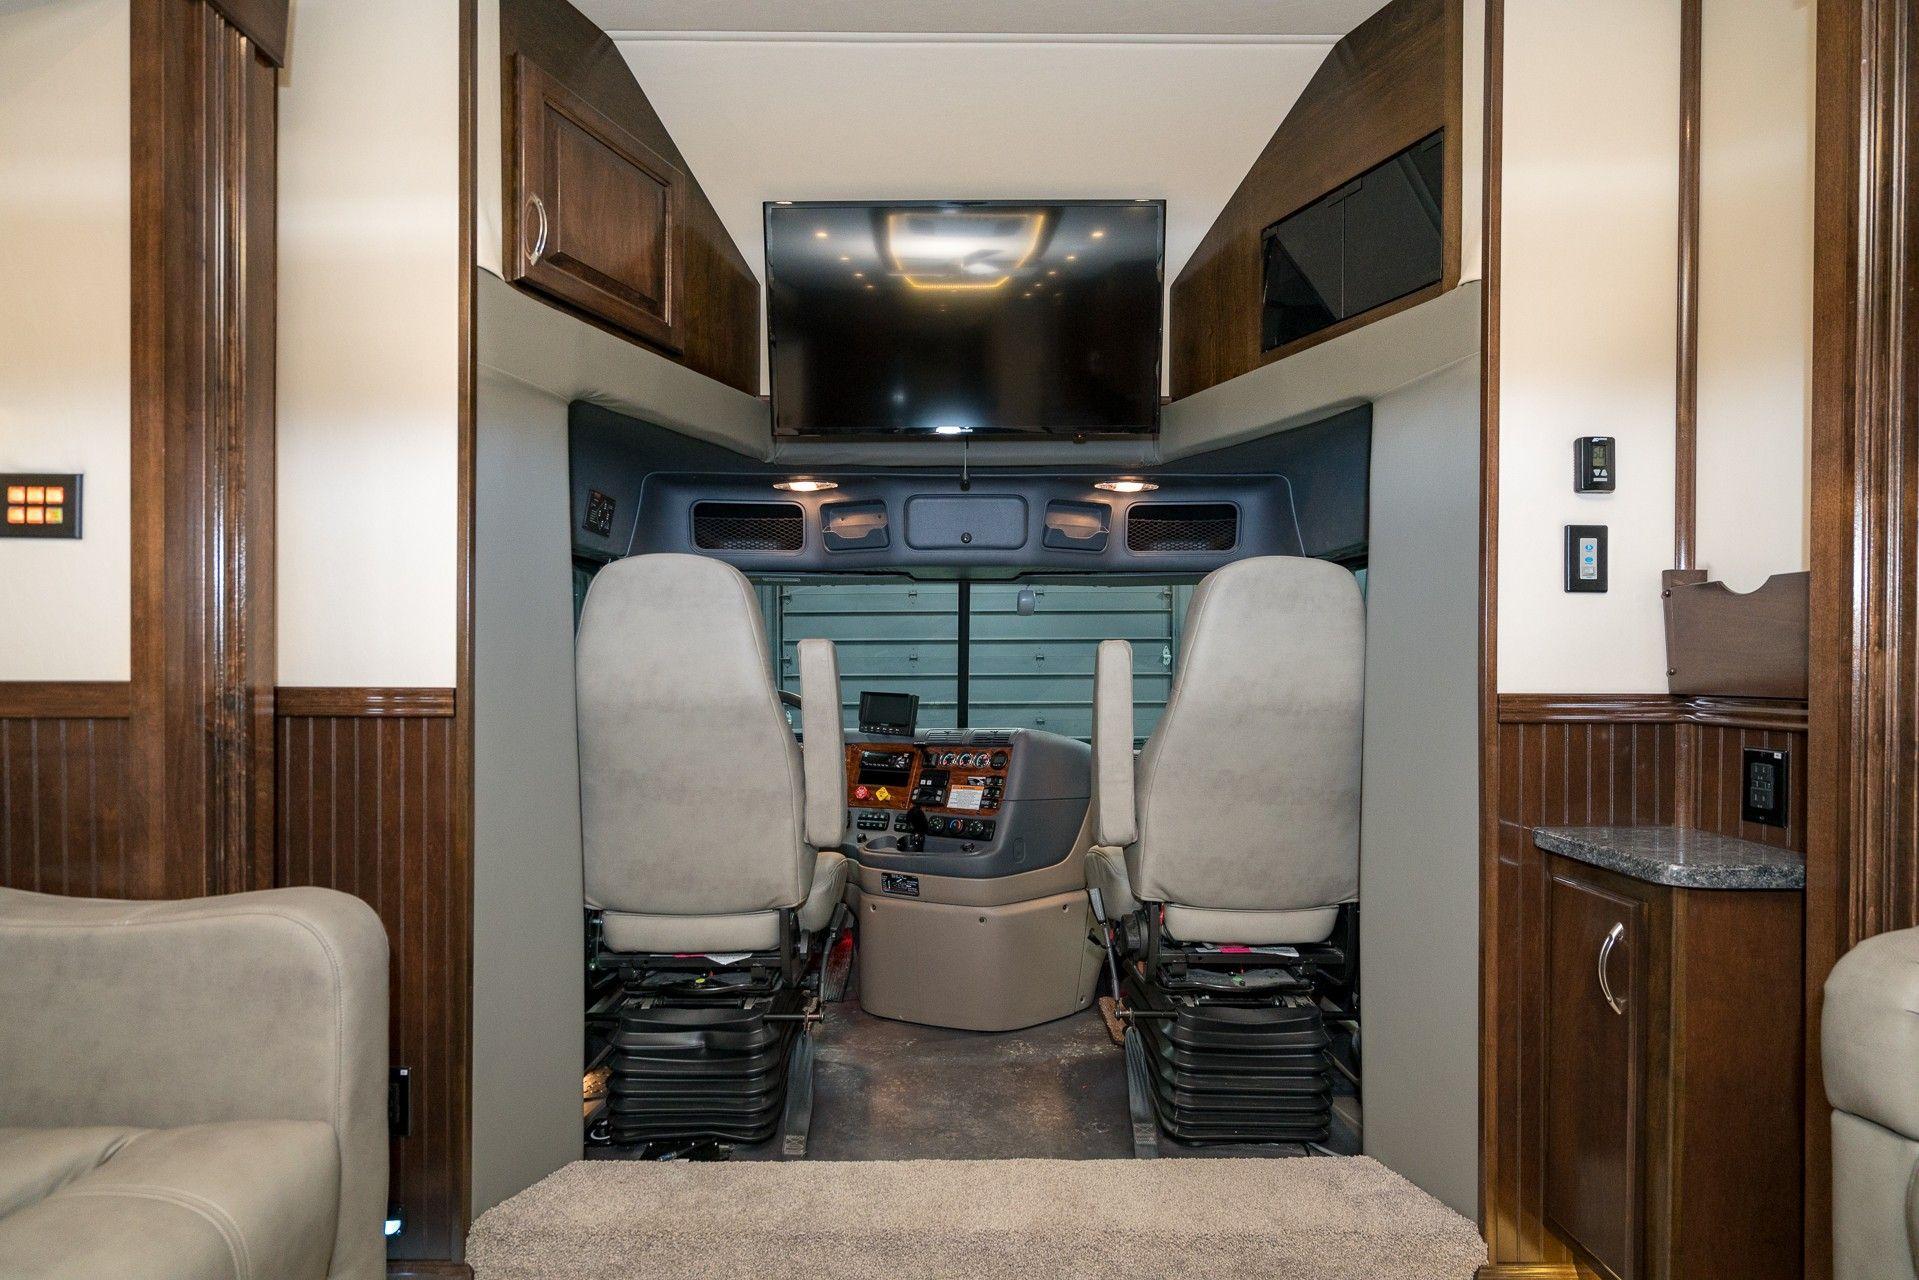 The Holistic Green Garden: 2018 Showhauler 45ft Super C Freightliner